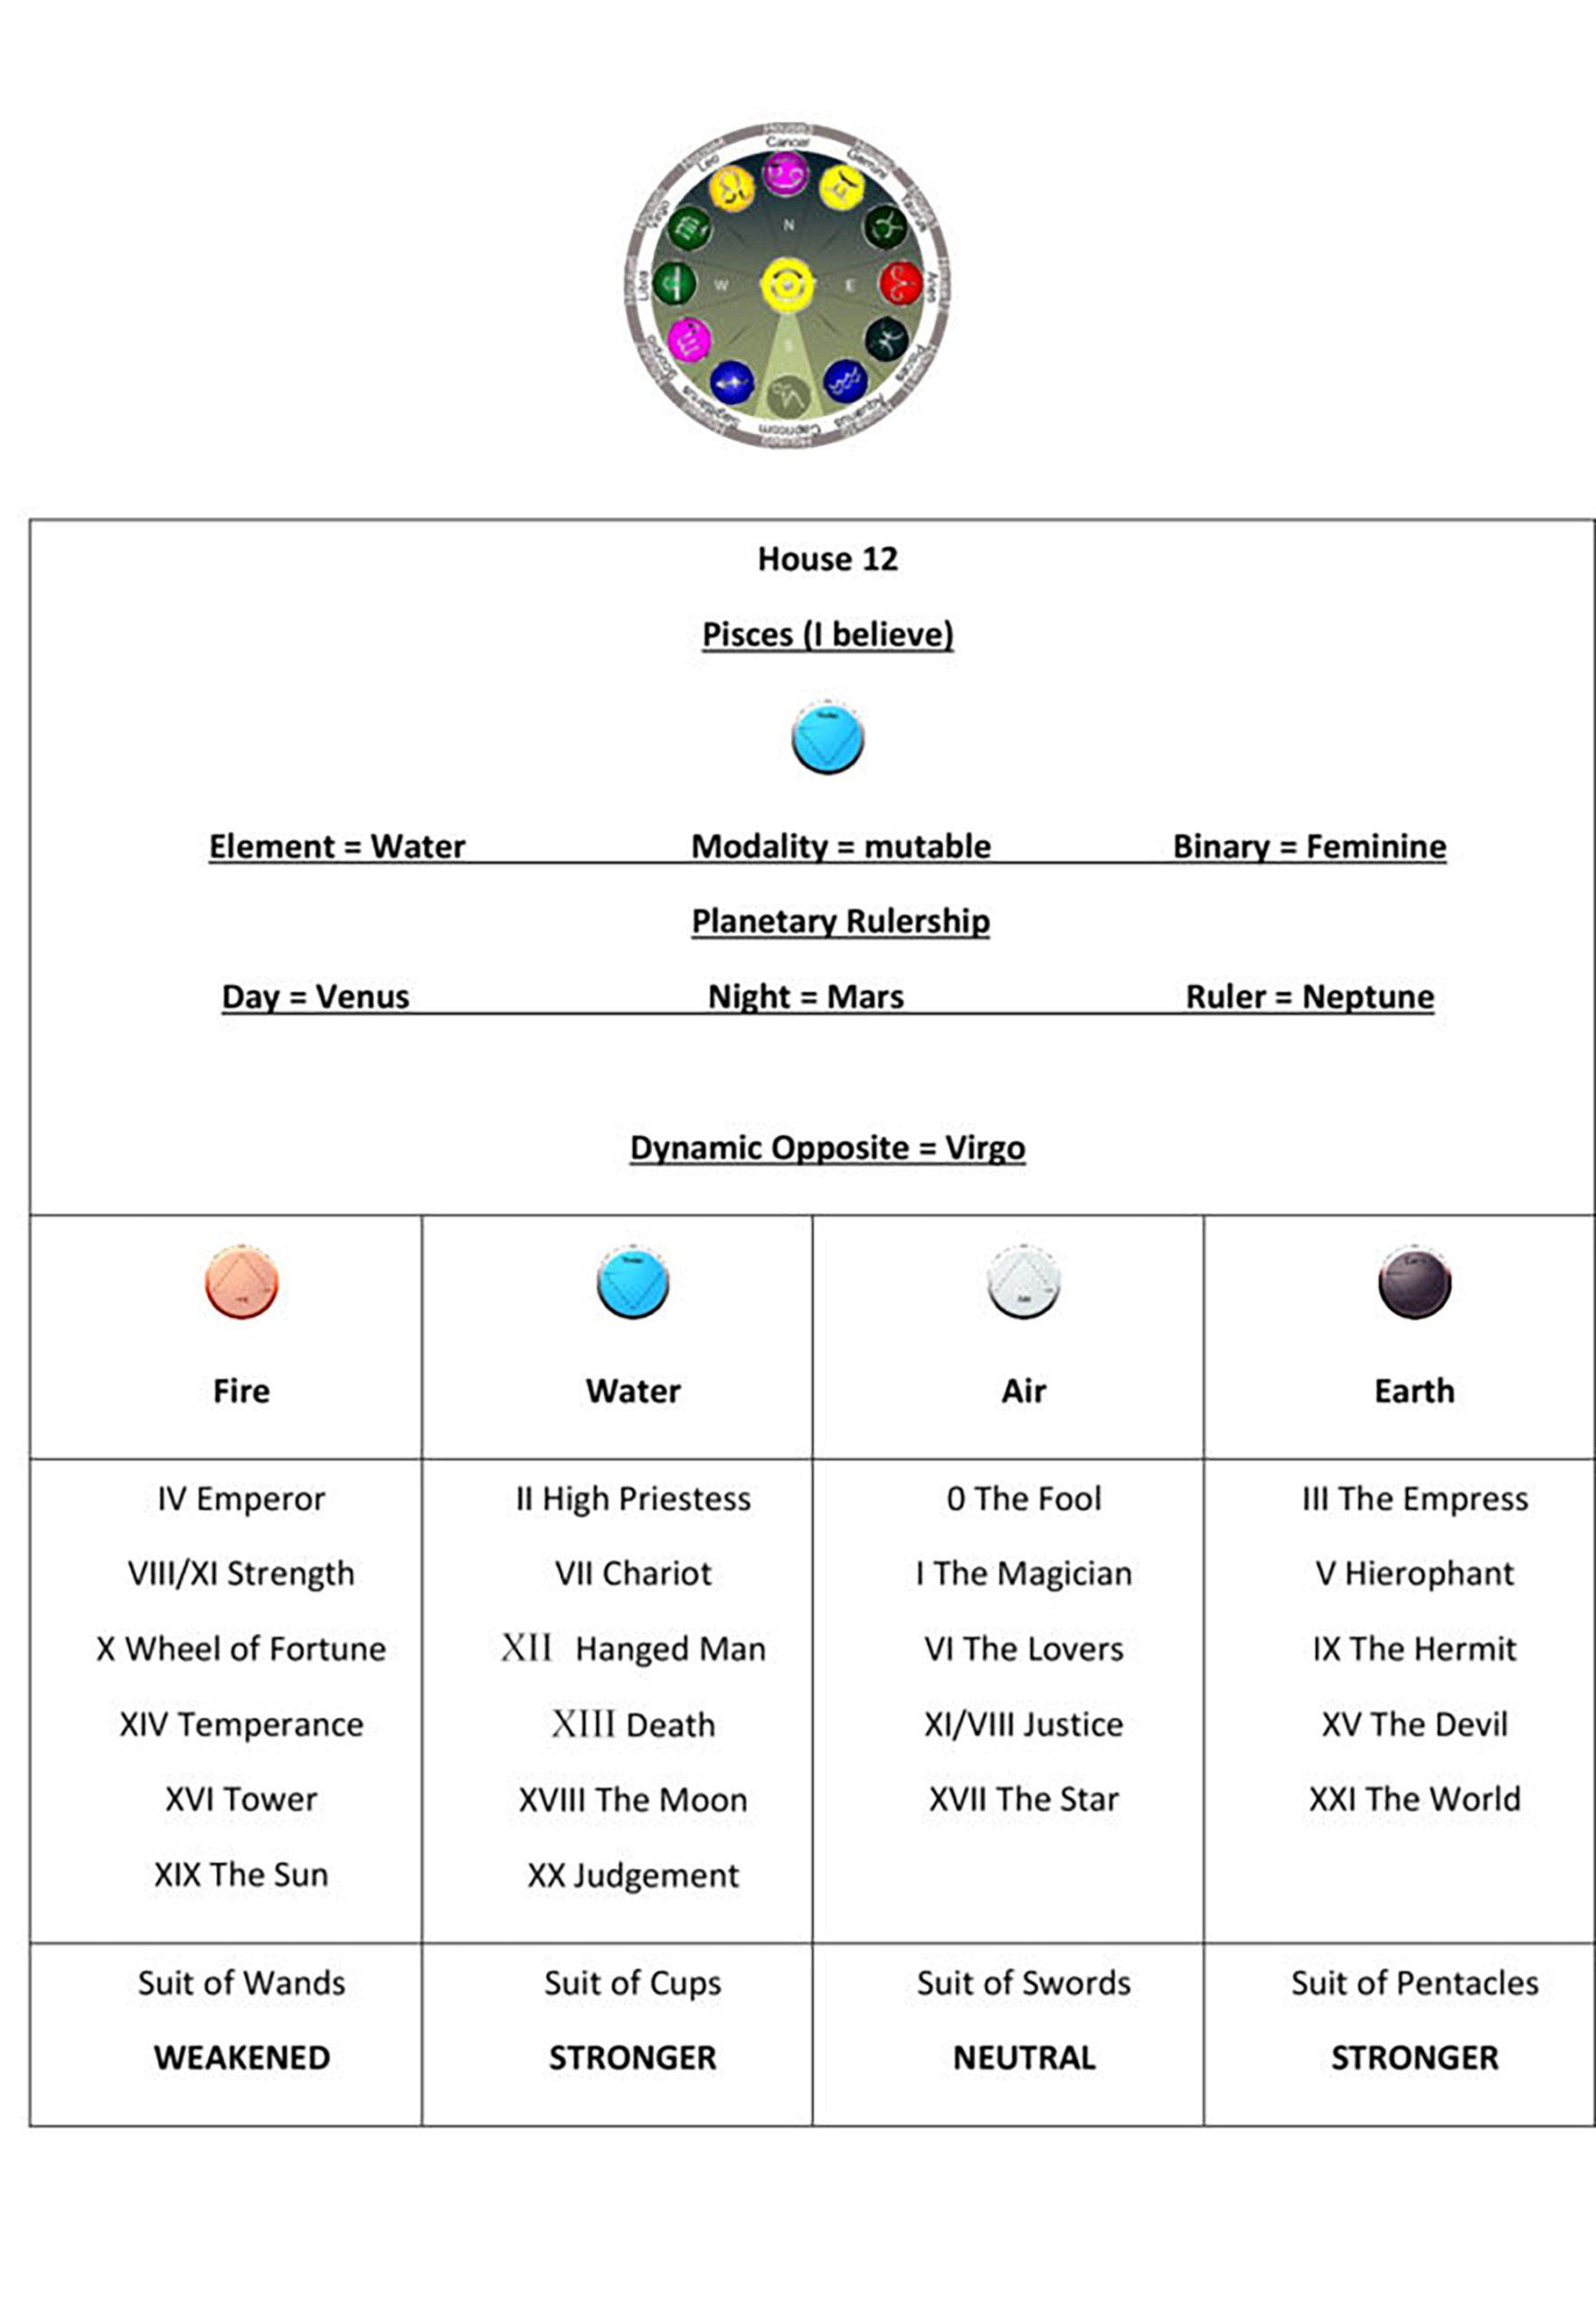 Astrology House 12 Chart1